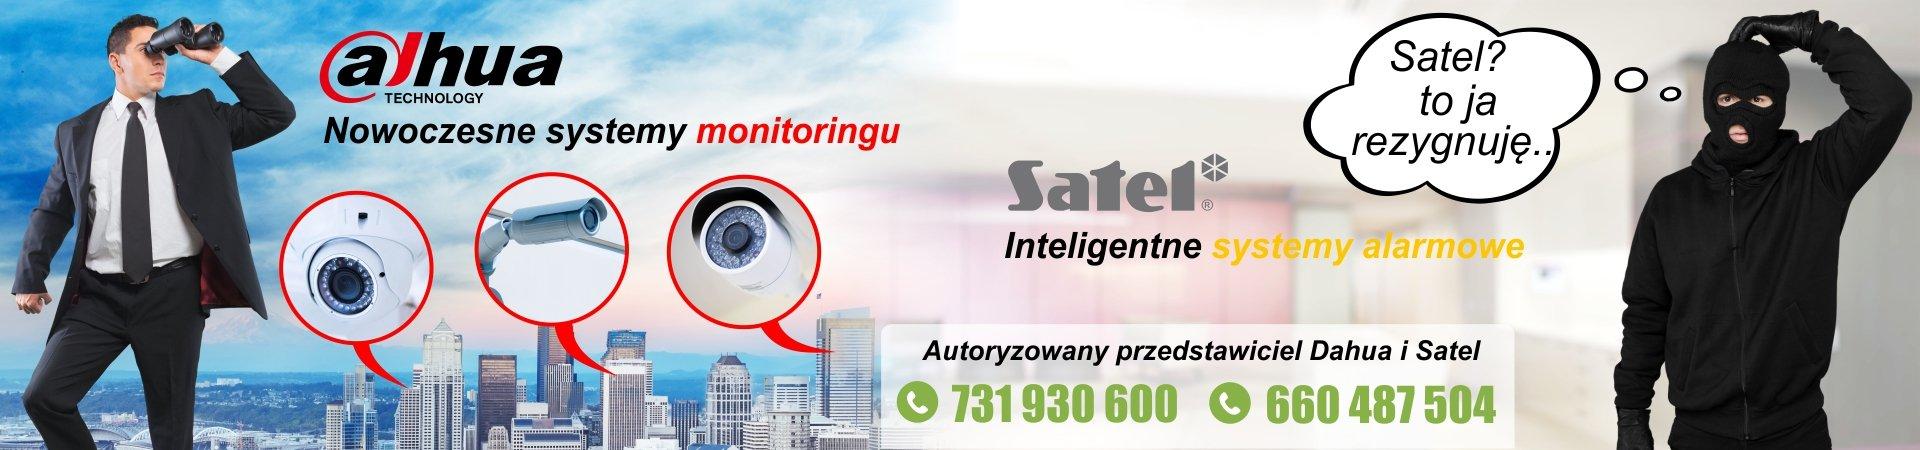 Instalacje alarmowe, Instalacje monitoringu, monitoring bielsko biała, alarm bielsko biała